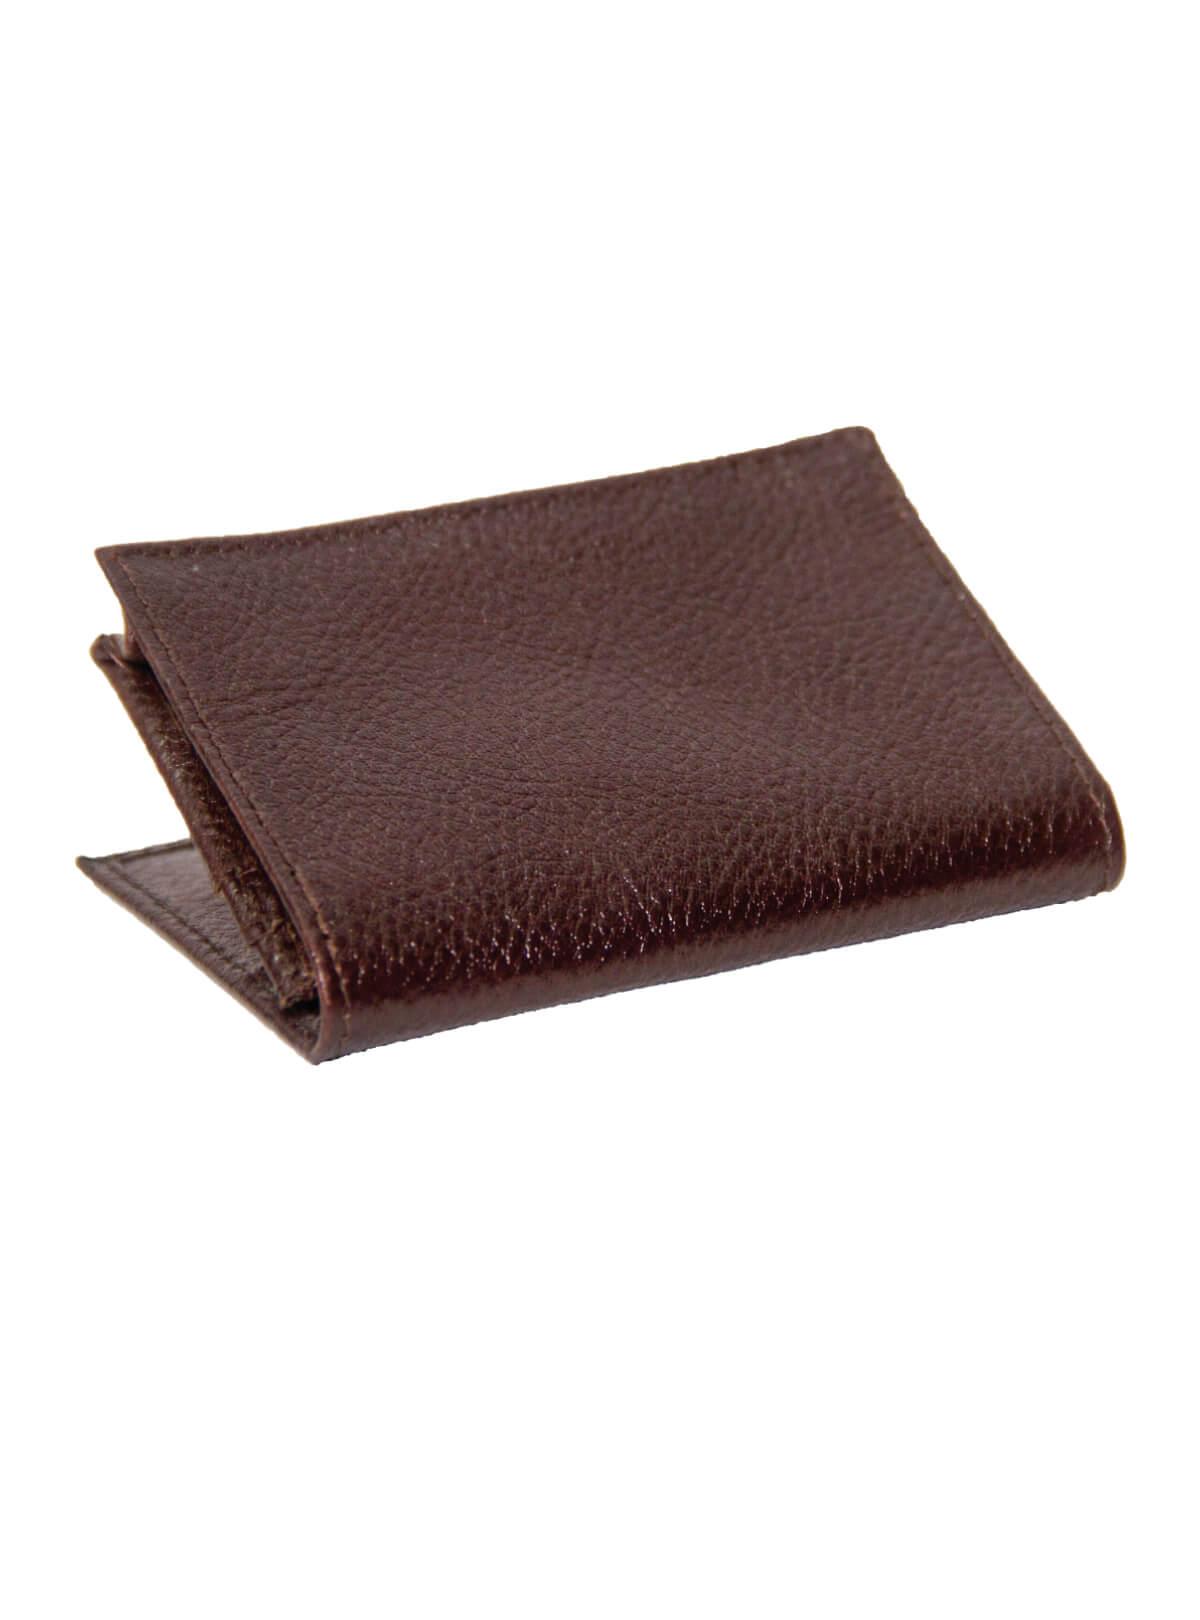 Brown Pod Leather Wallet/Card Holder